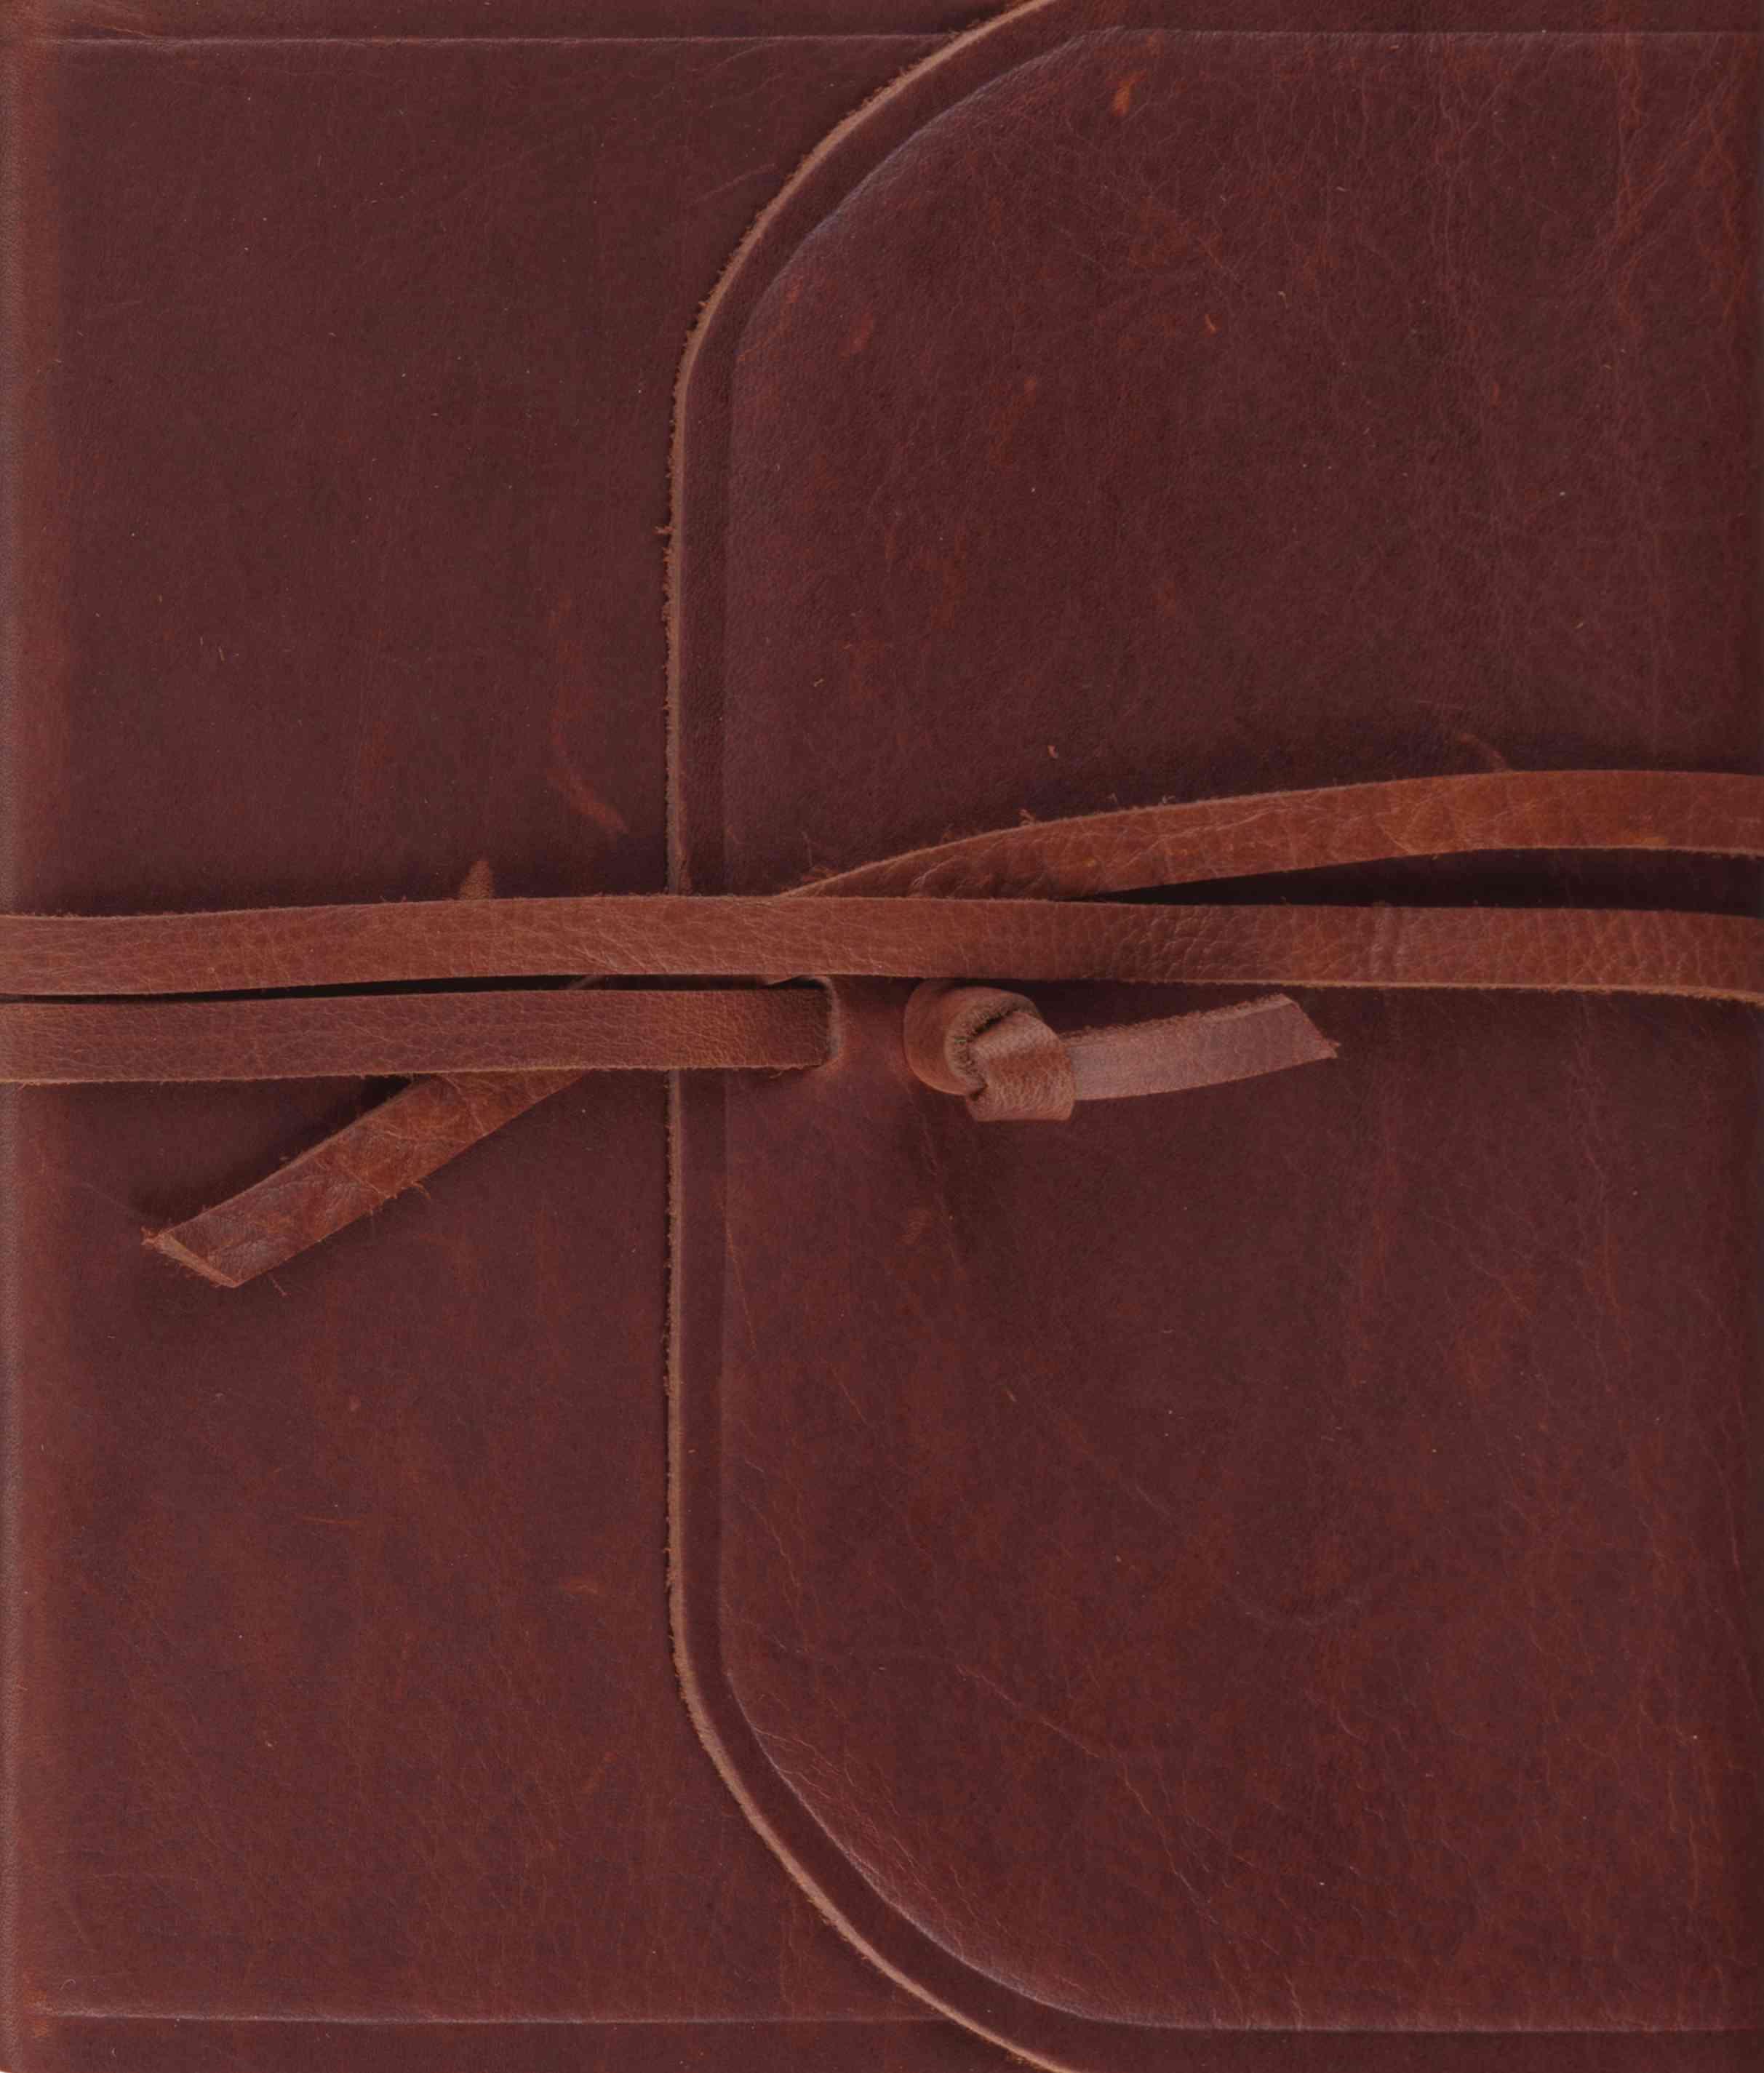 The Holy Bible: English Standard Version, Brown, Natural Leather, Single Column Journaling Bible (Paperback)